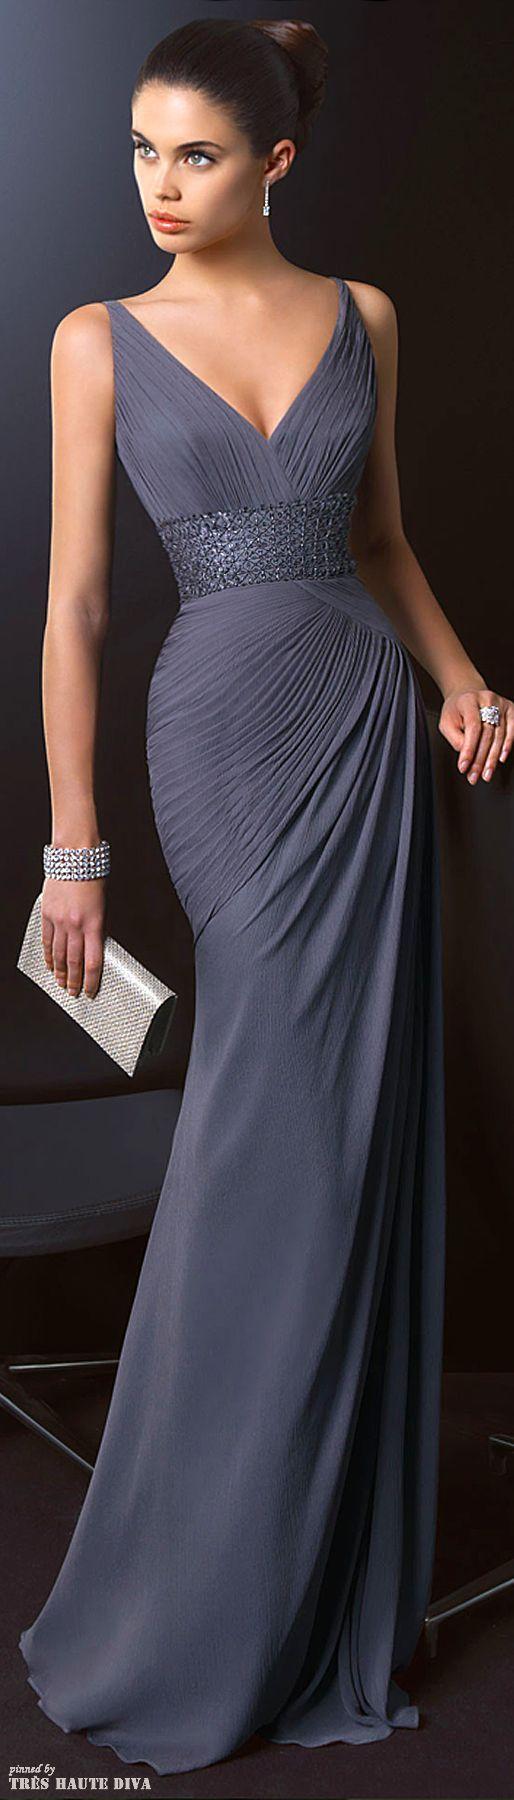 Long Dark Grey Chiffon Evening Gown